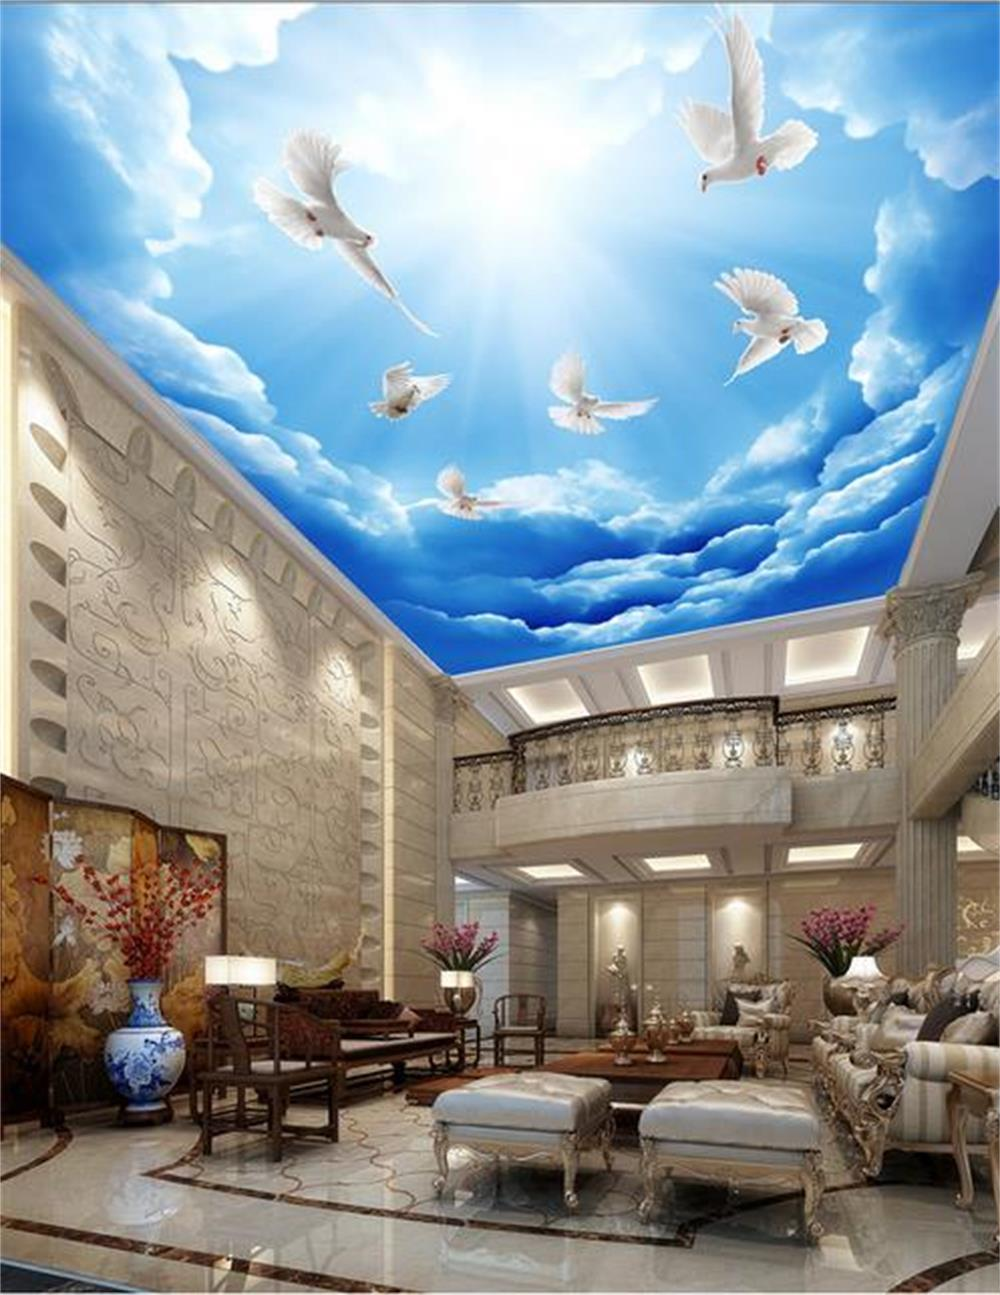 Online Buy Grosir Biru Hotel Bar Ktv Wallpaper From China Biru